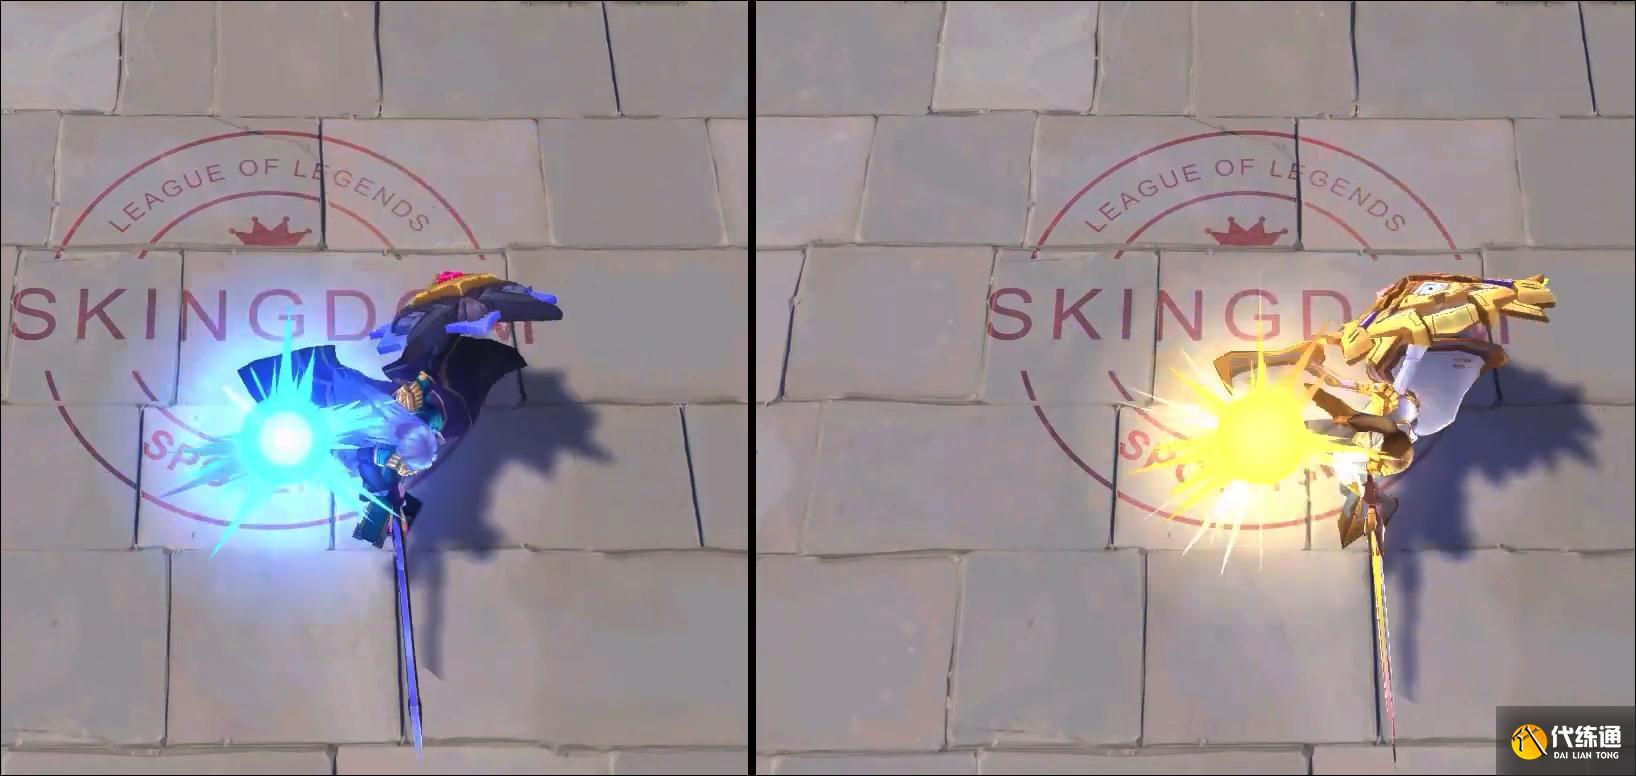 LOL蕾歐娜戰斗學院普通版VS至臻版:造型大不同,但特效沒差